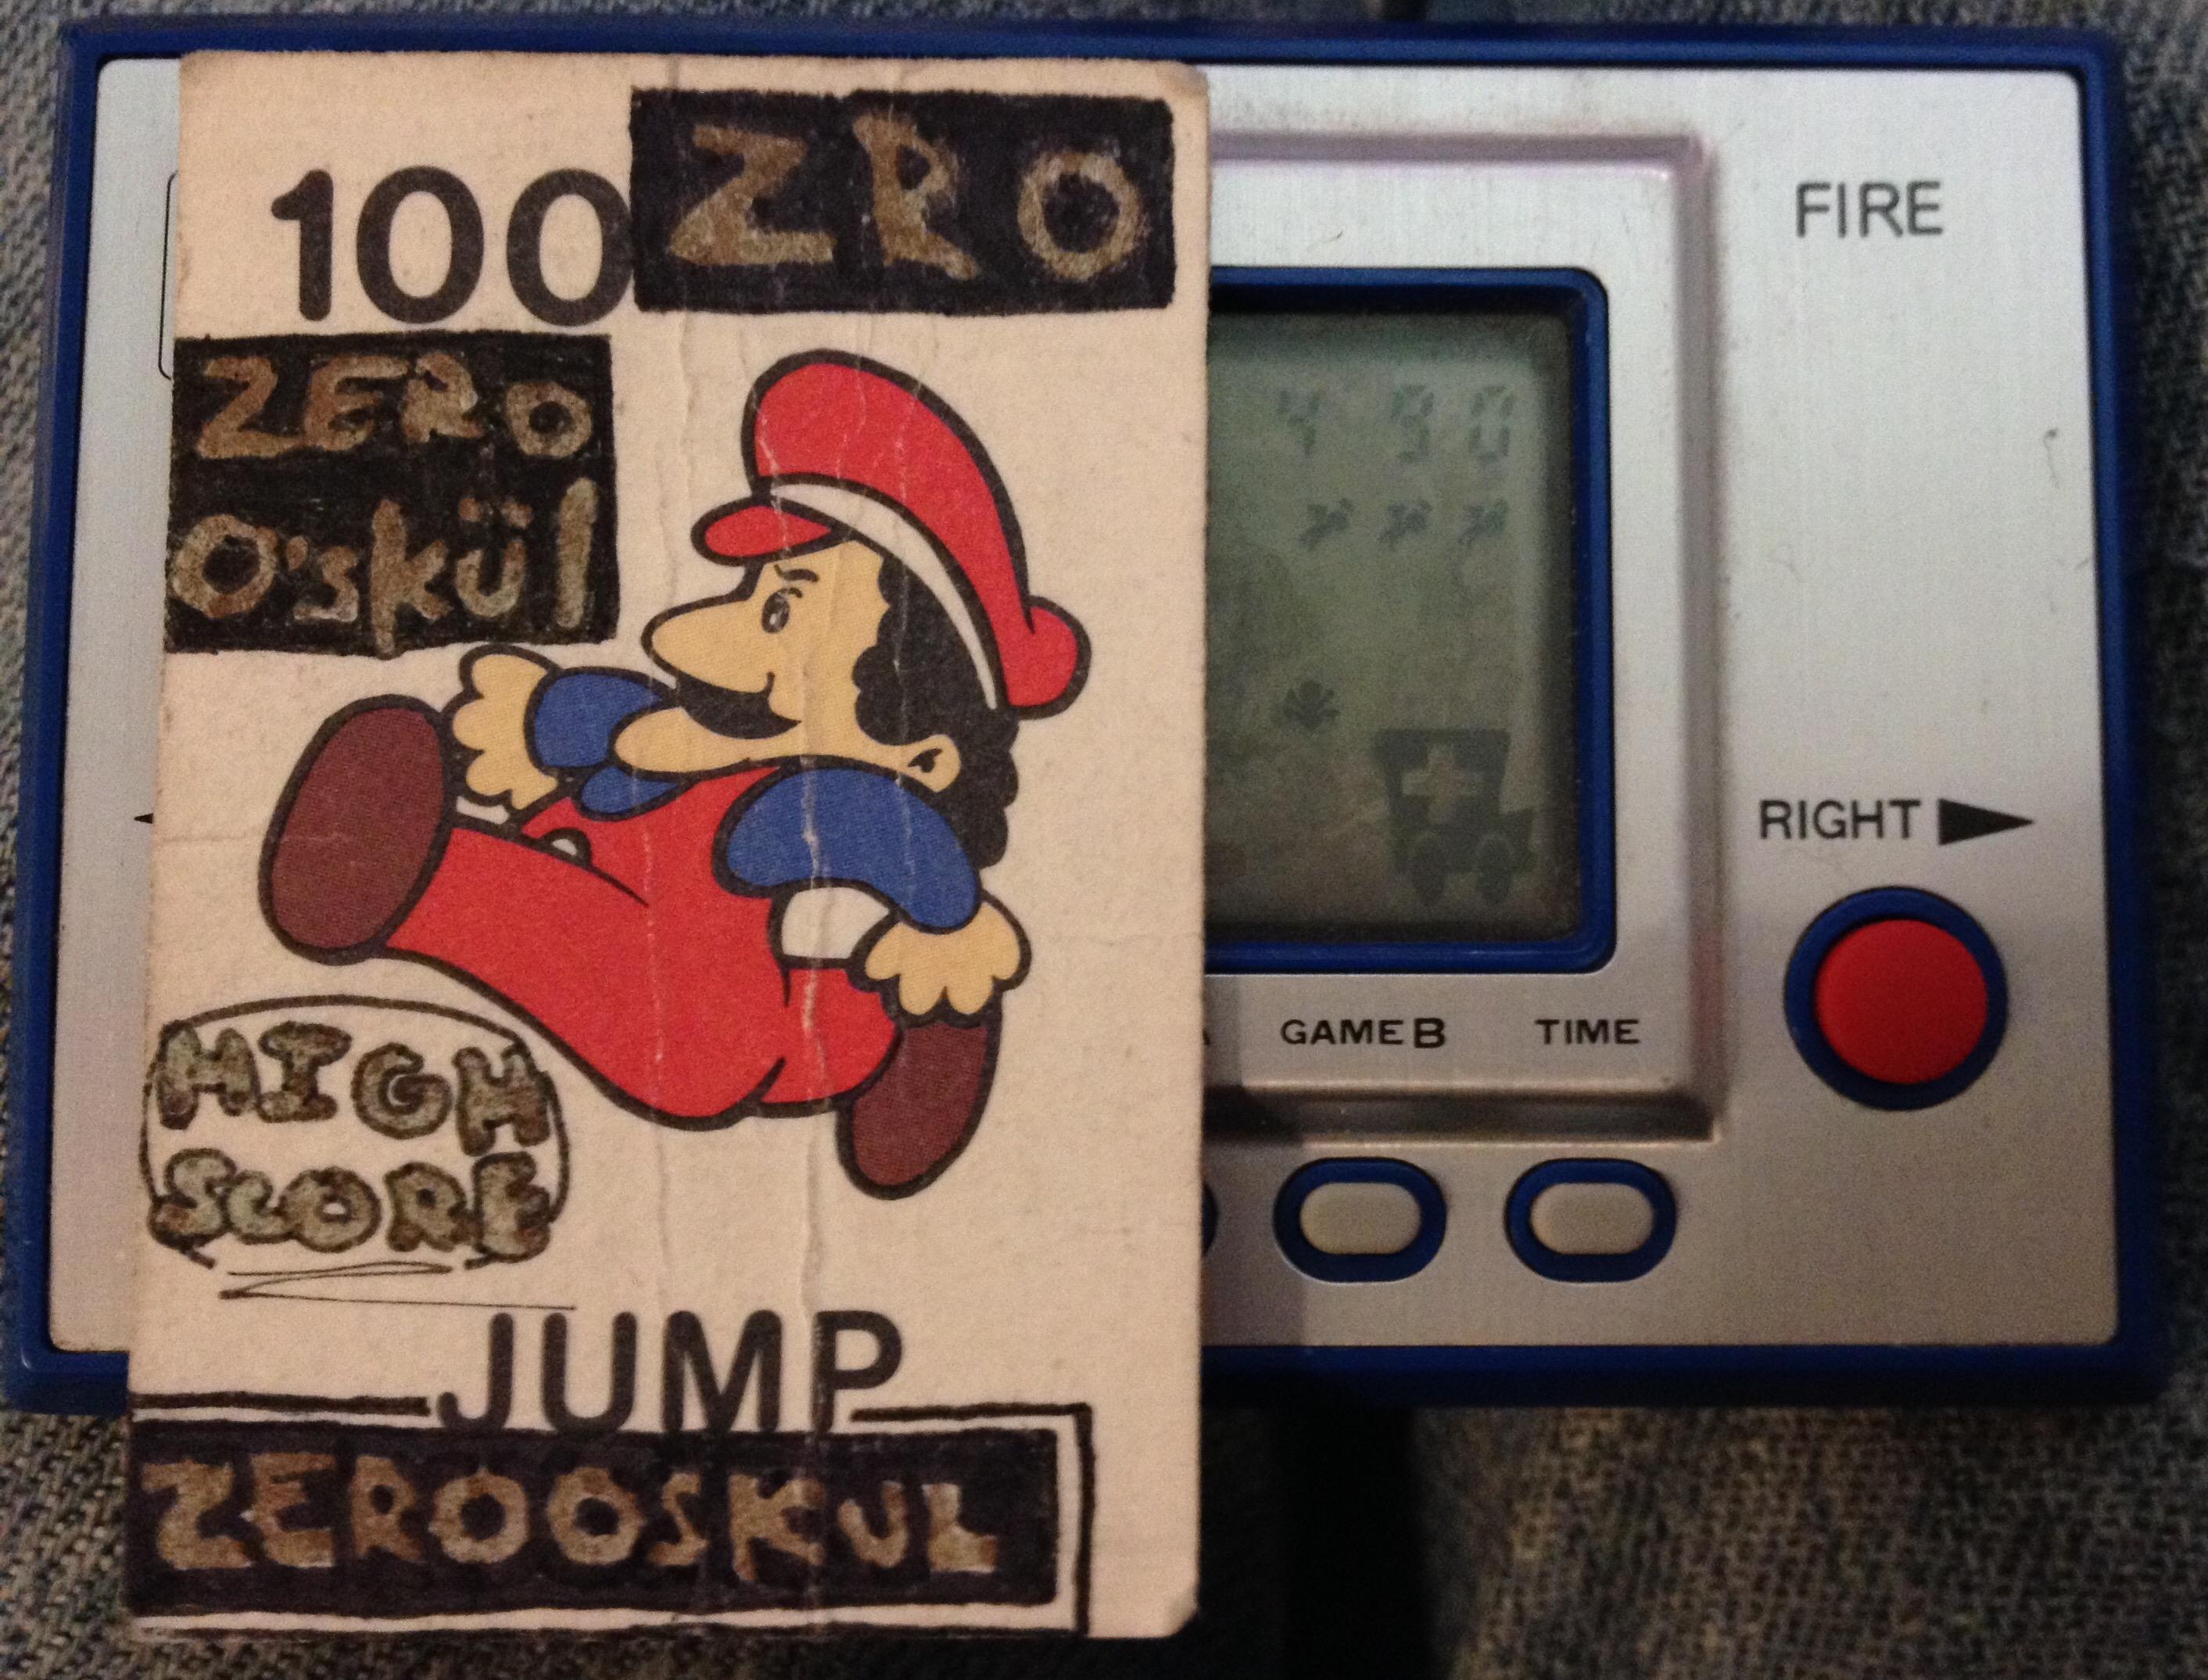 Game & Watch: Fire [aka Fireman Fireman] [Game A] 490 points